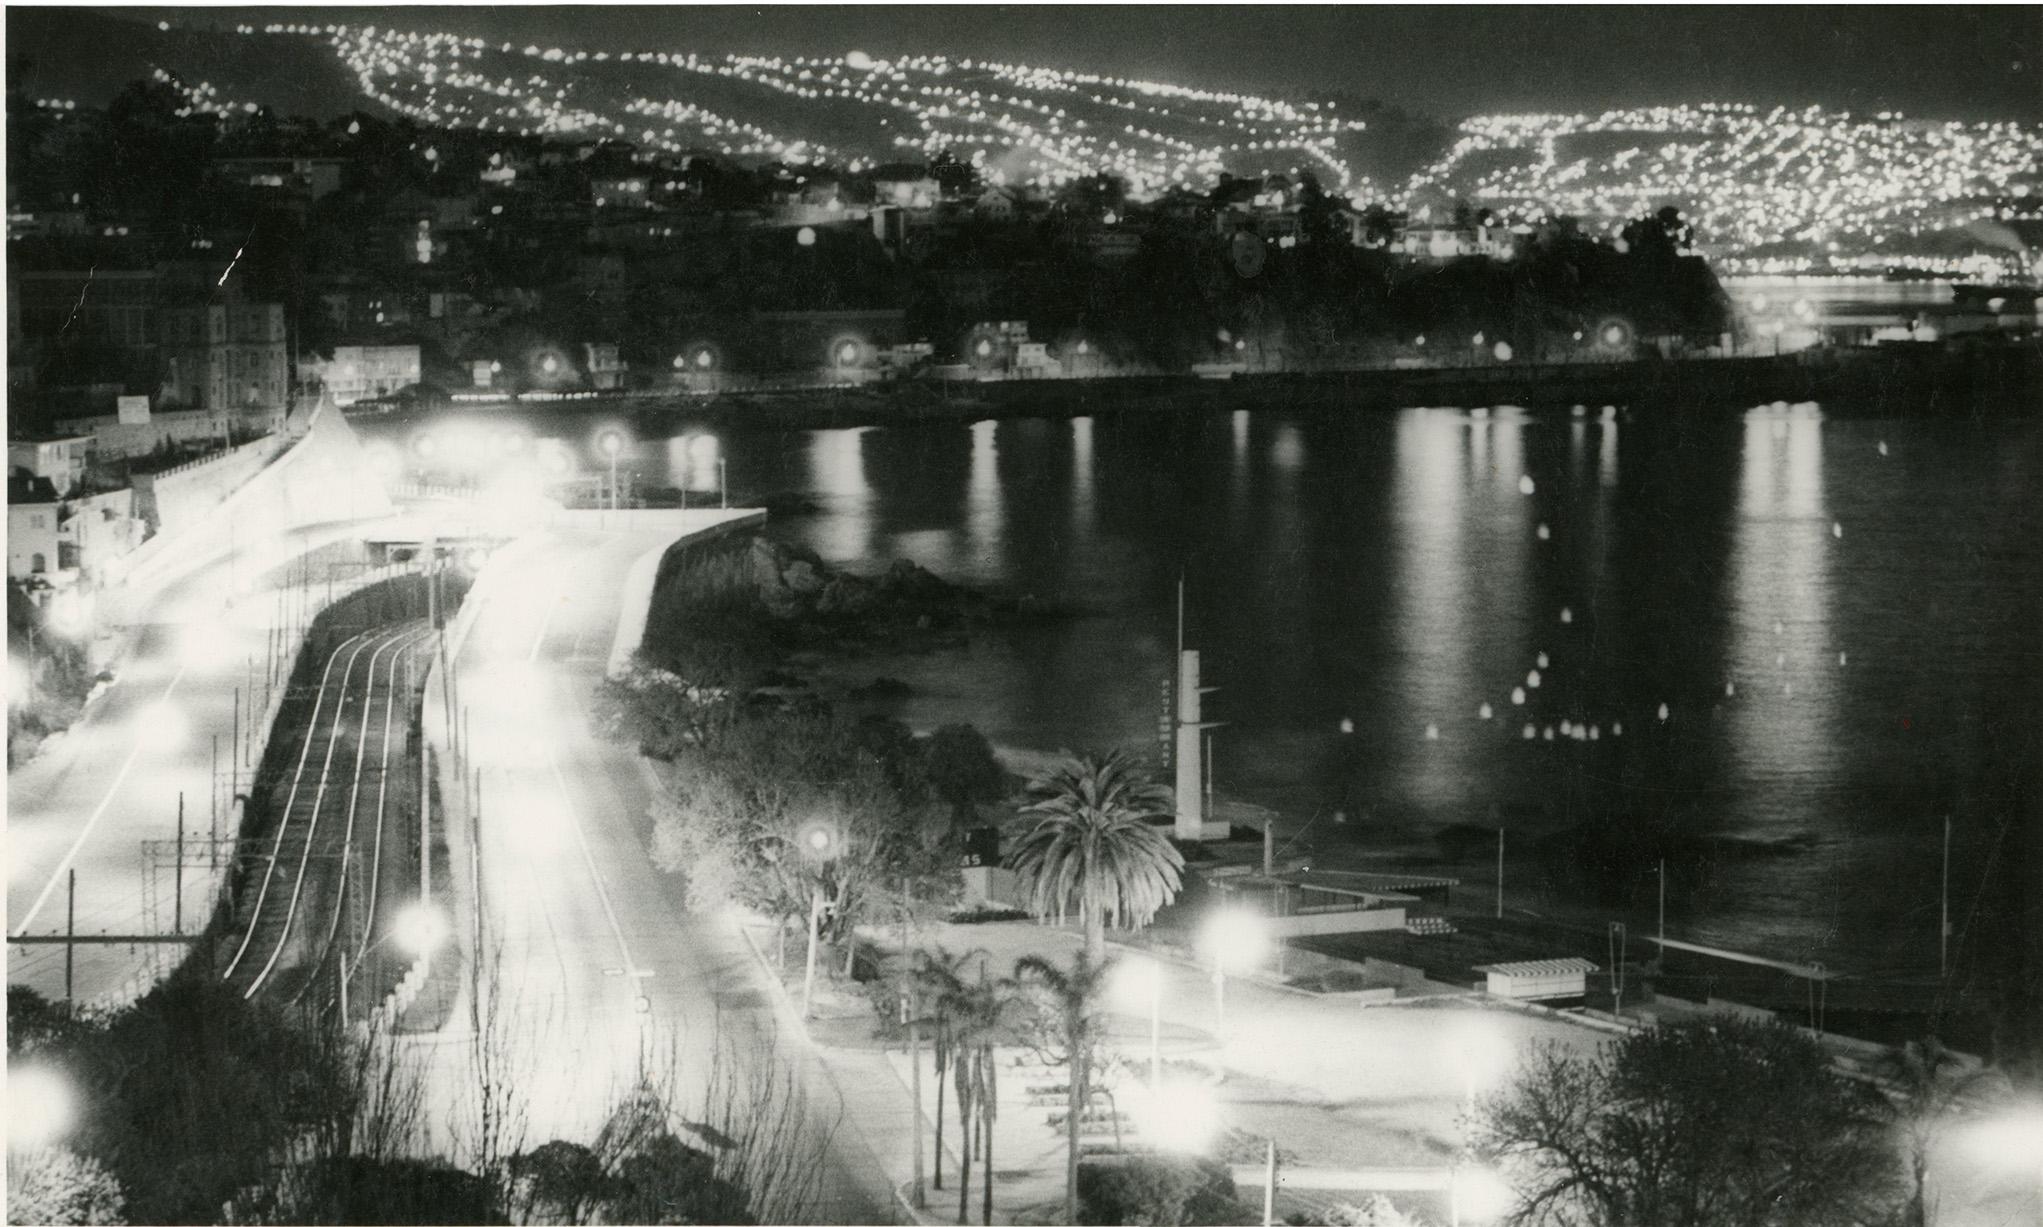 Enterreno - Fotos históricas de chile - fotos antiguas de Chile - Av España, Viña del Mar, 1973